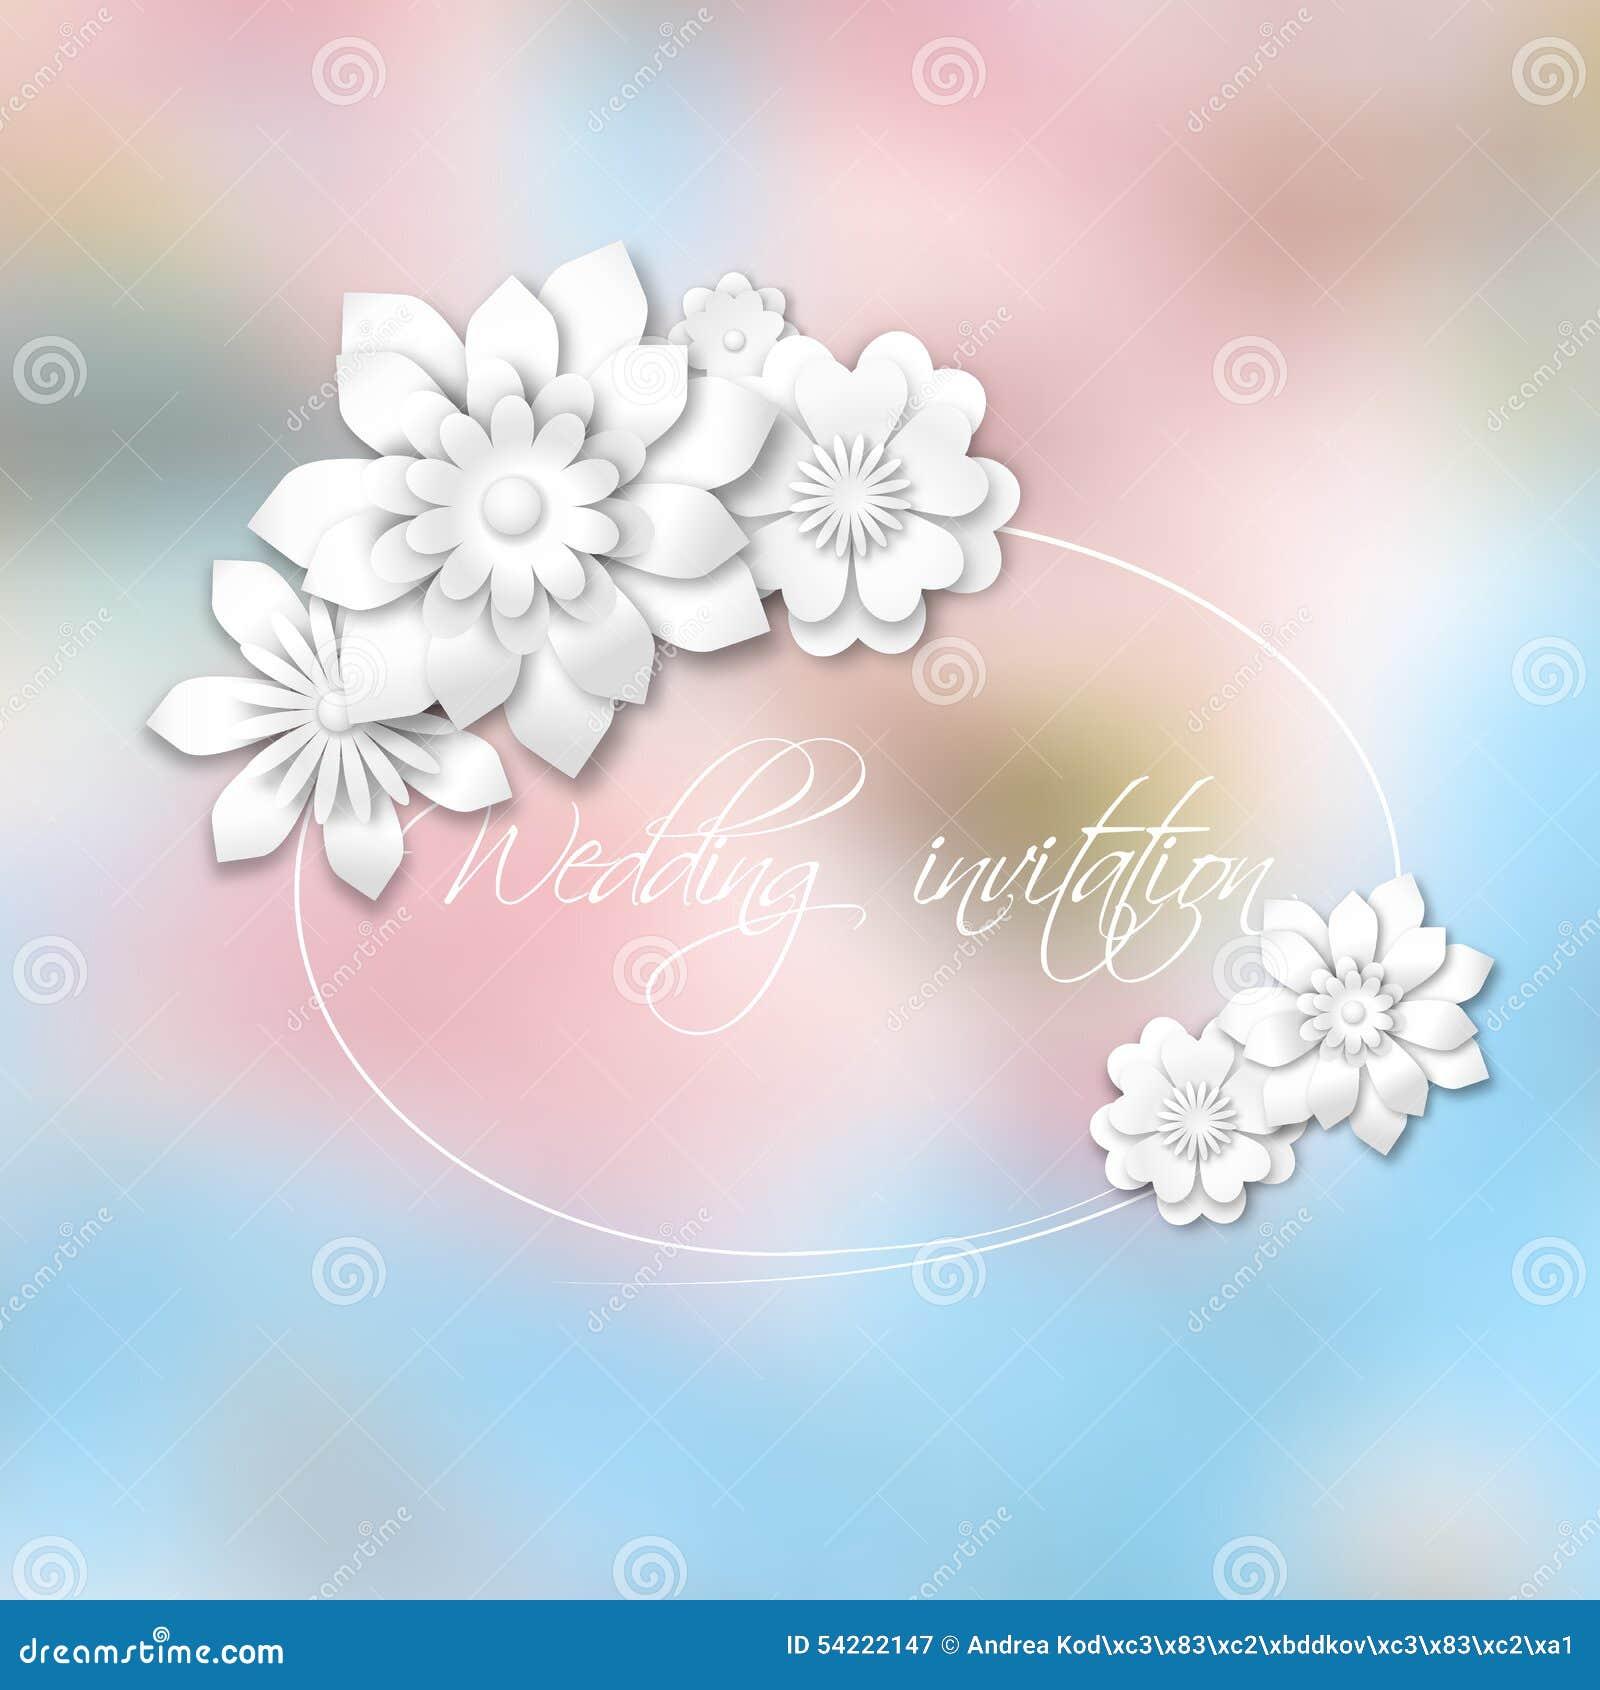 Bokeh Flowers Wedding: Wedding Invitation Stock Vector. Illustration Of Blurry